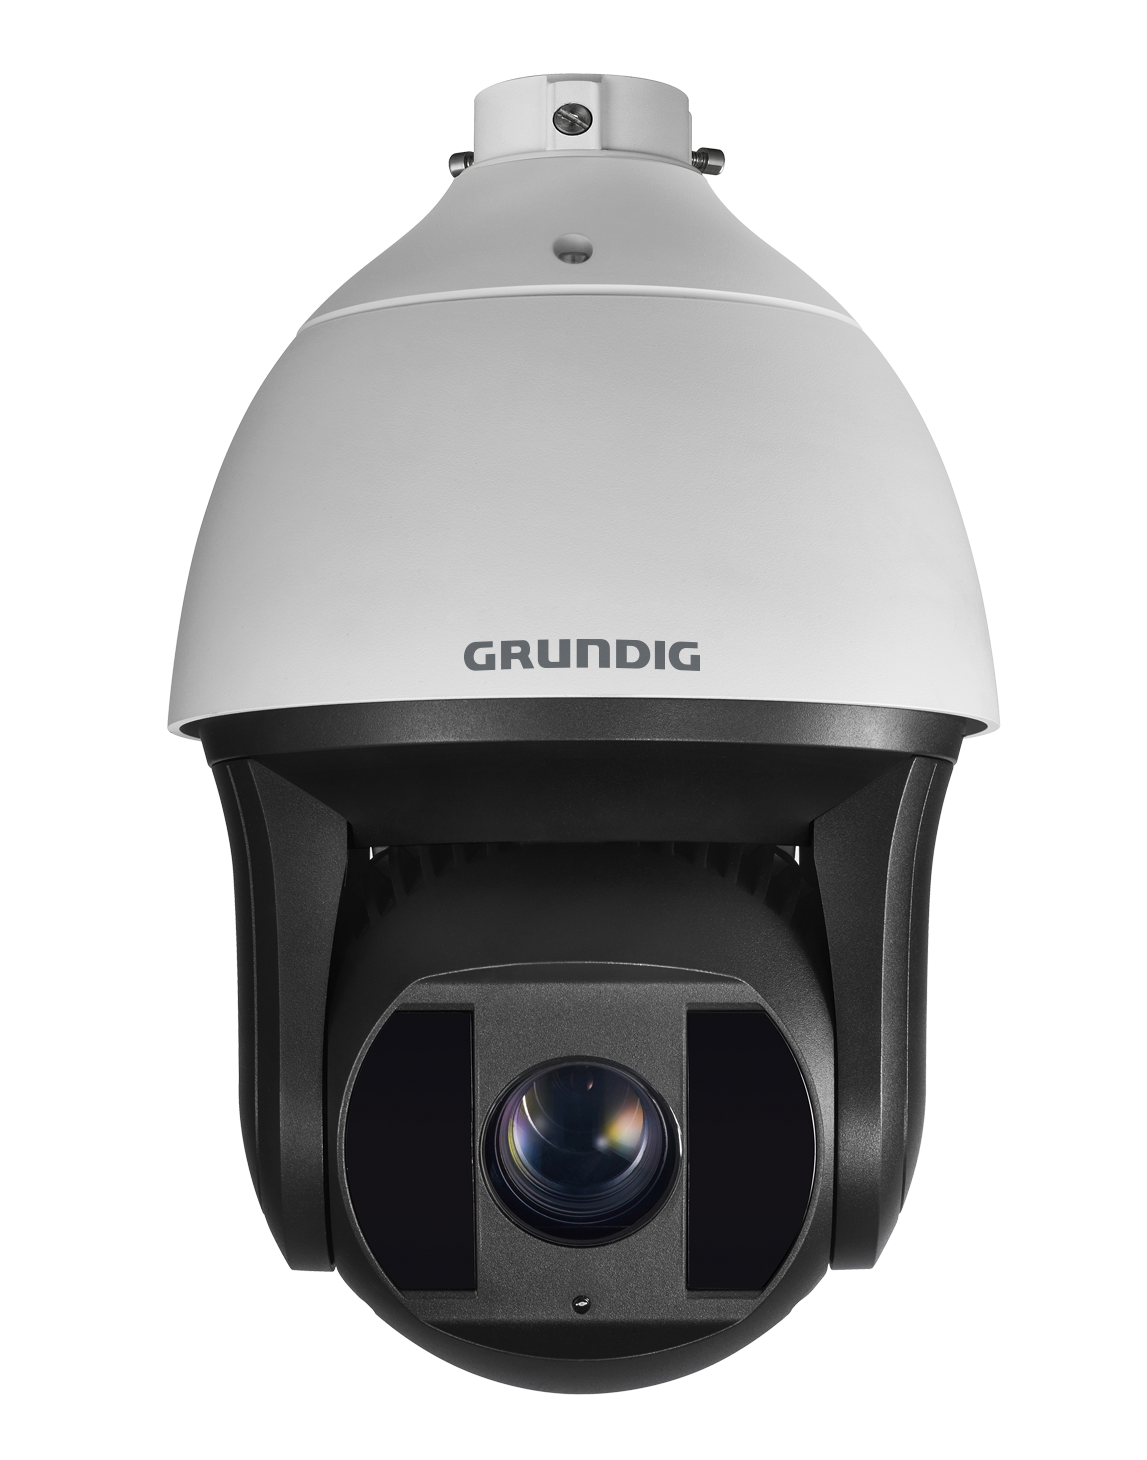 grundig-ptz-dome-ip-camera